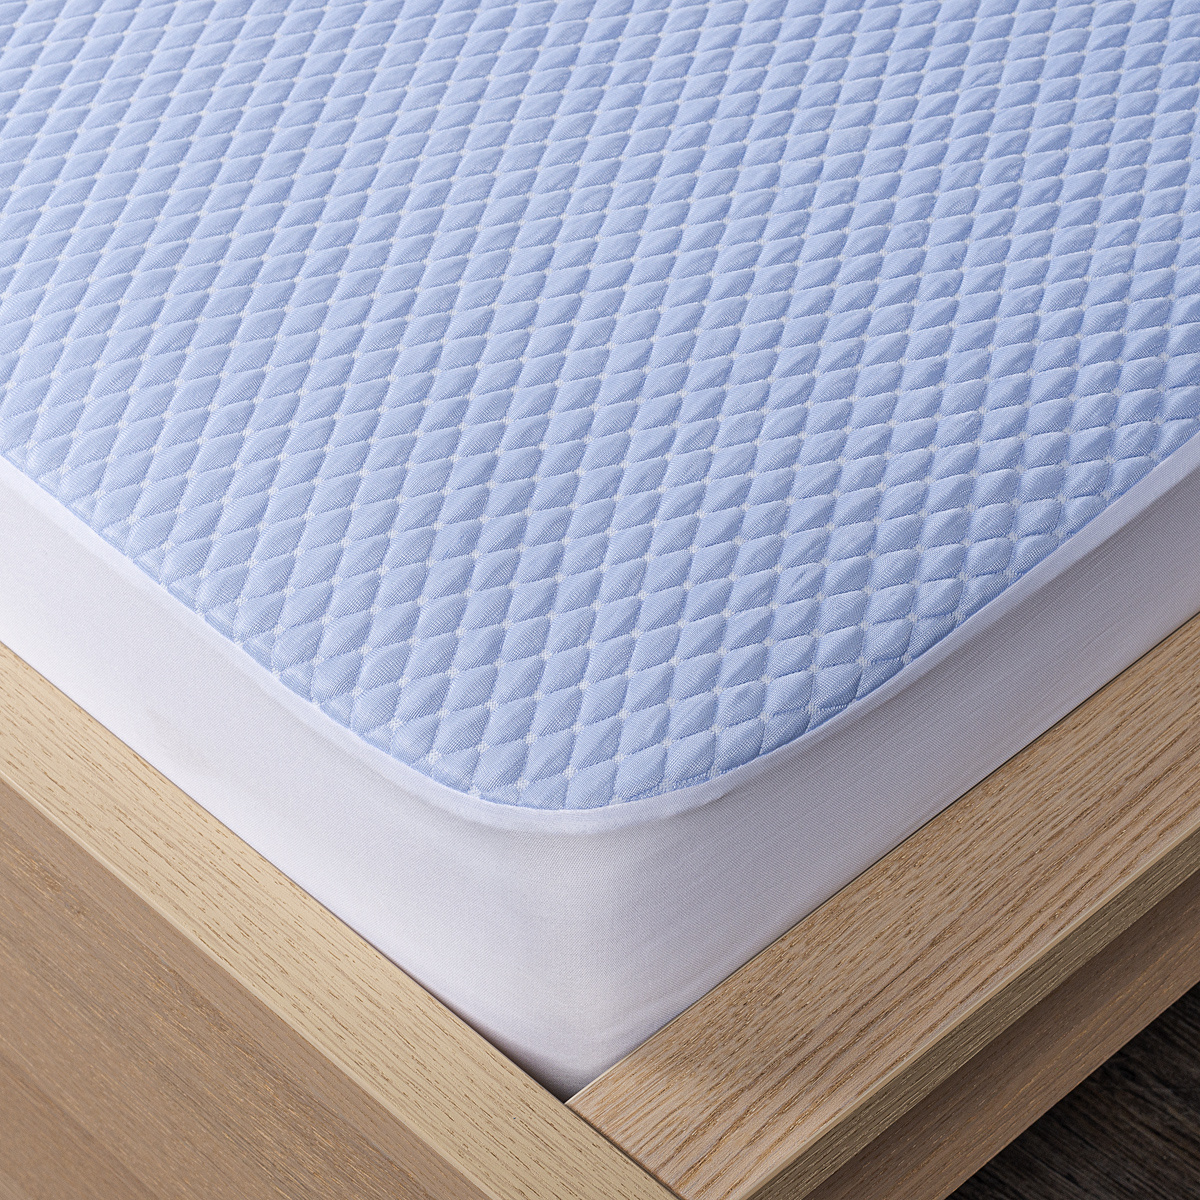 4Home Chladicí chránič matrace s lemem Cooler, 160 x 200 cm